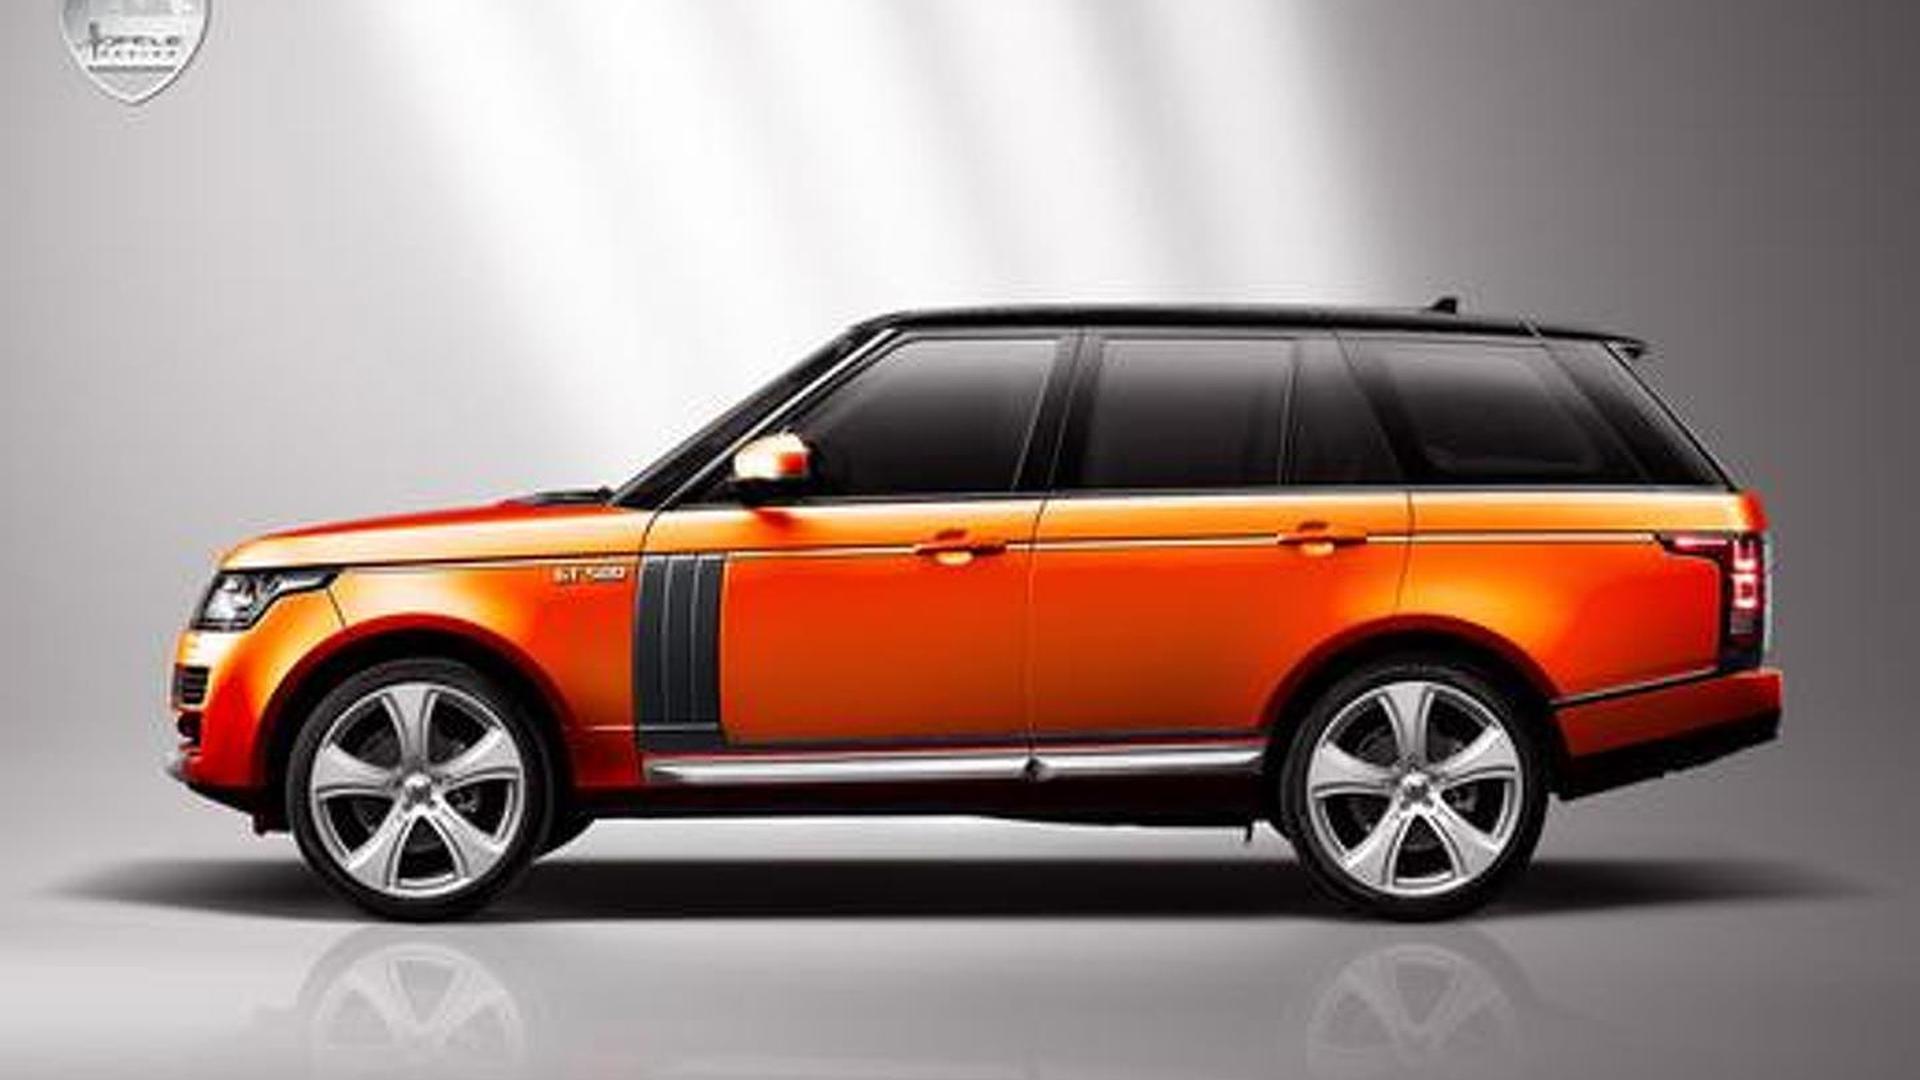 Hofele Design previews the Royster GT 500 - based on new Range Rover